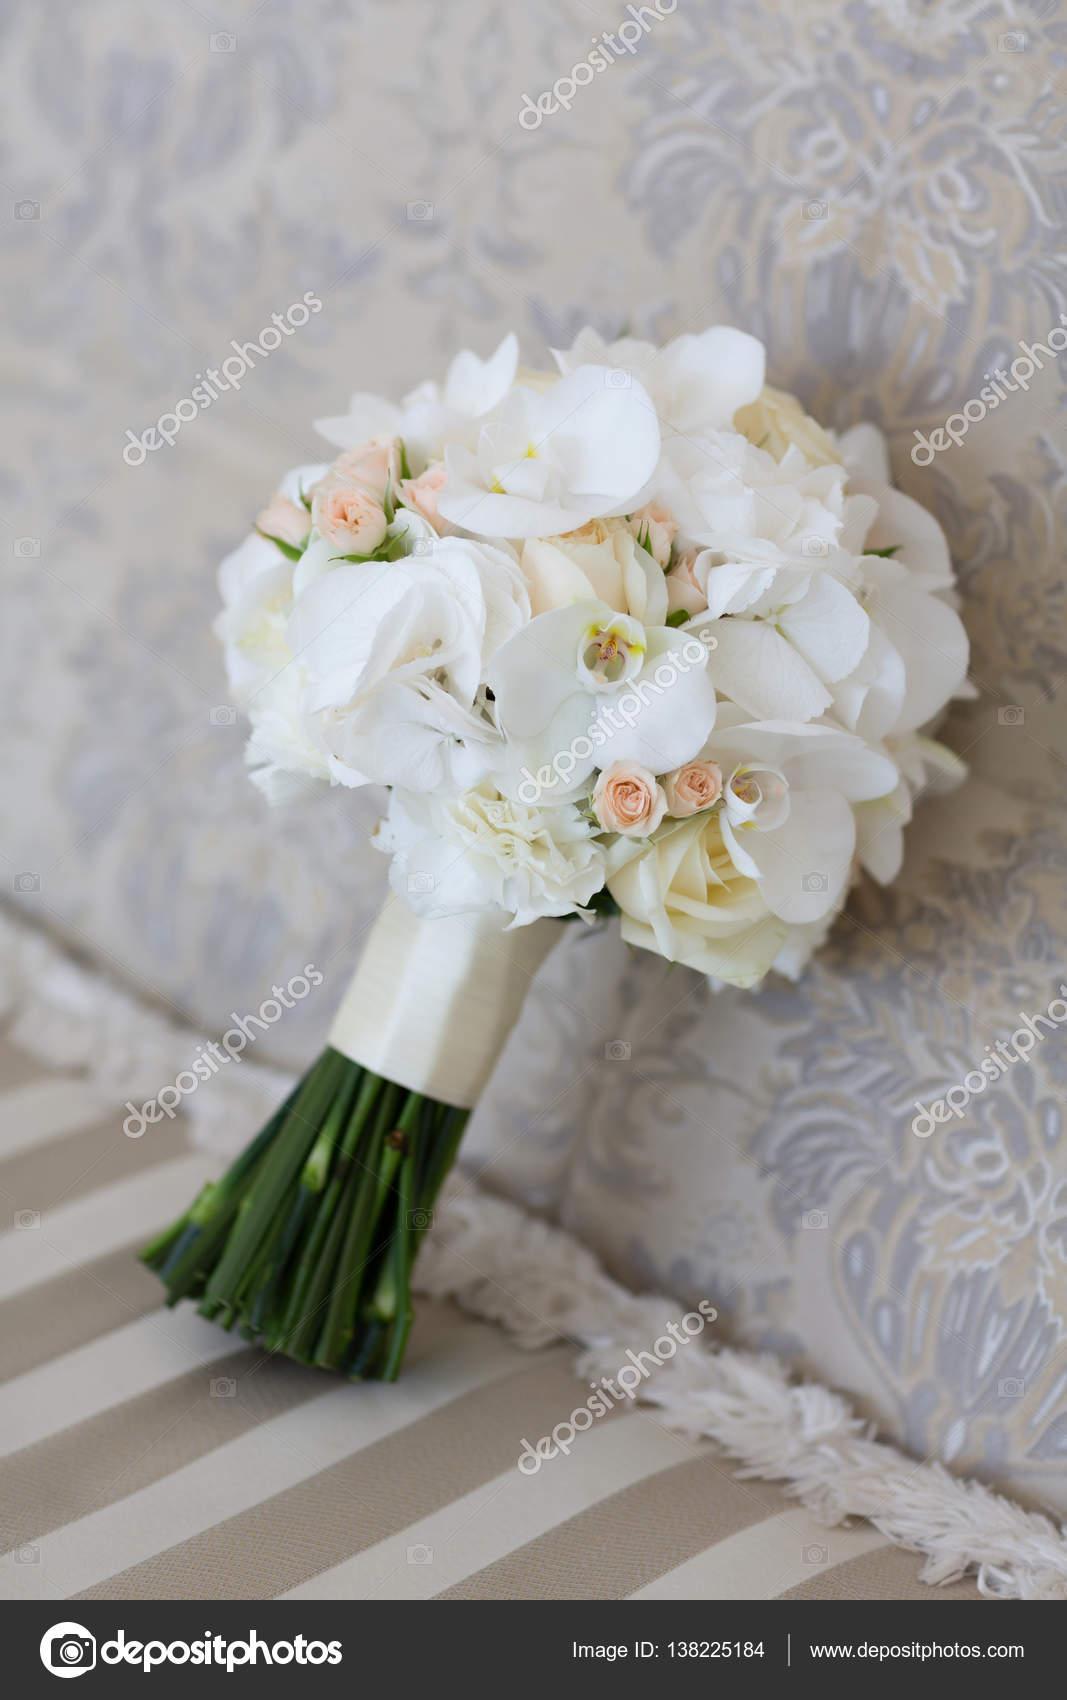 Wedding bouquet of white orchids stock photo zagursky85ail wedding bouquet of white orchids stock photo mightylinksfo